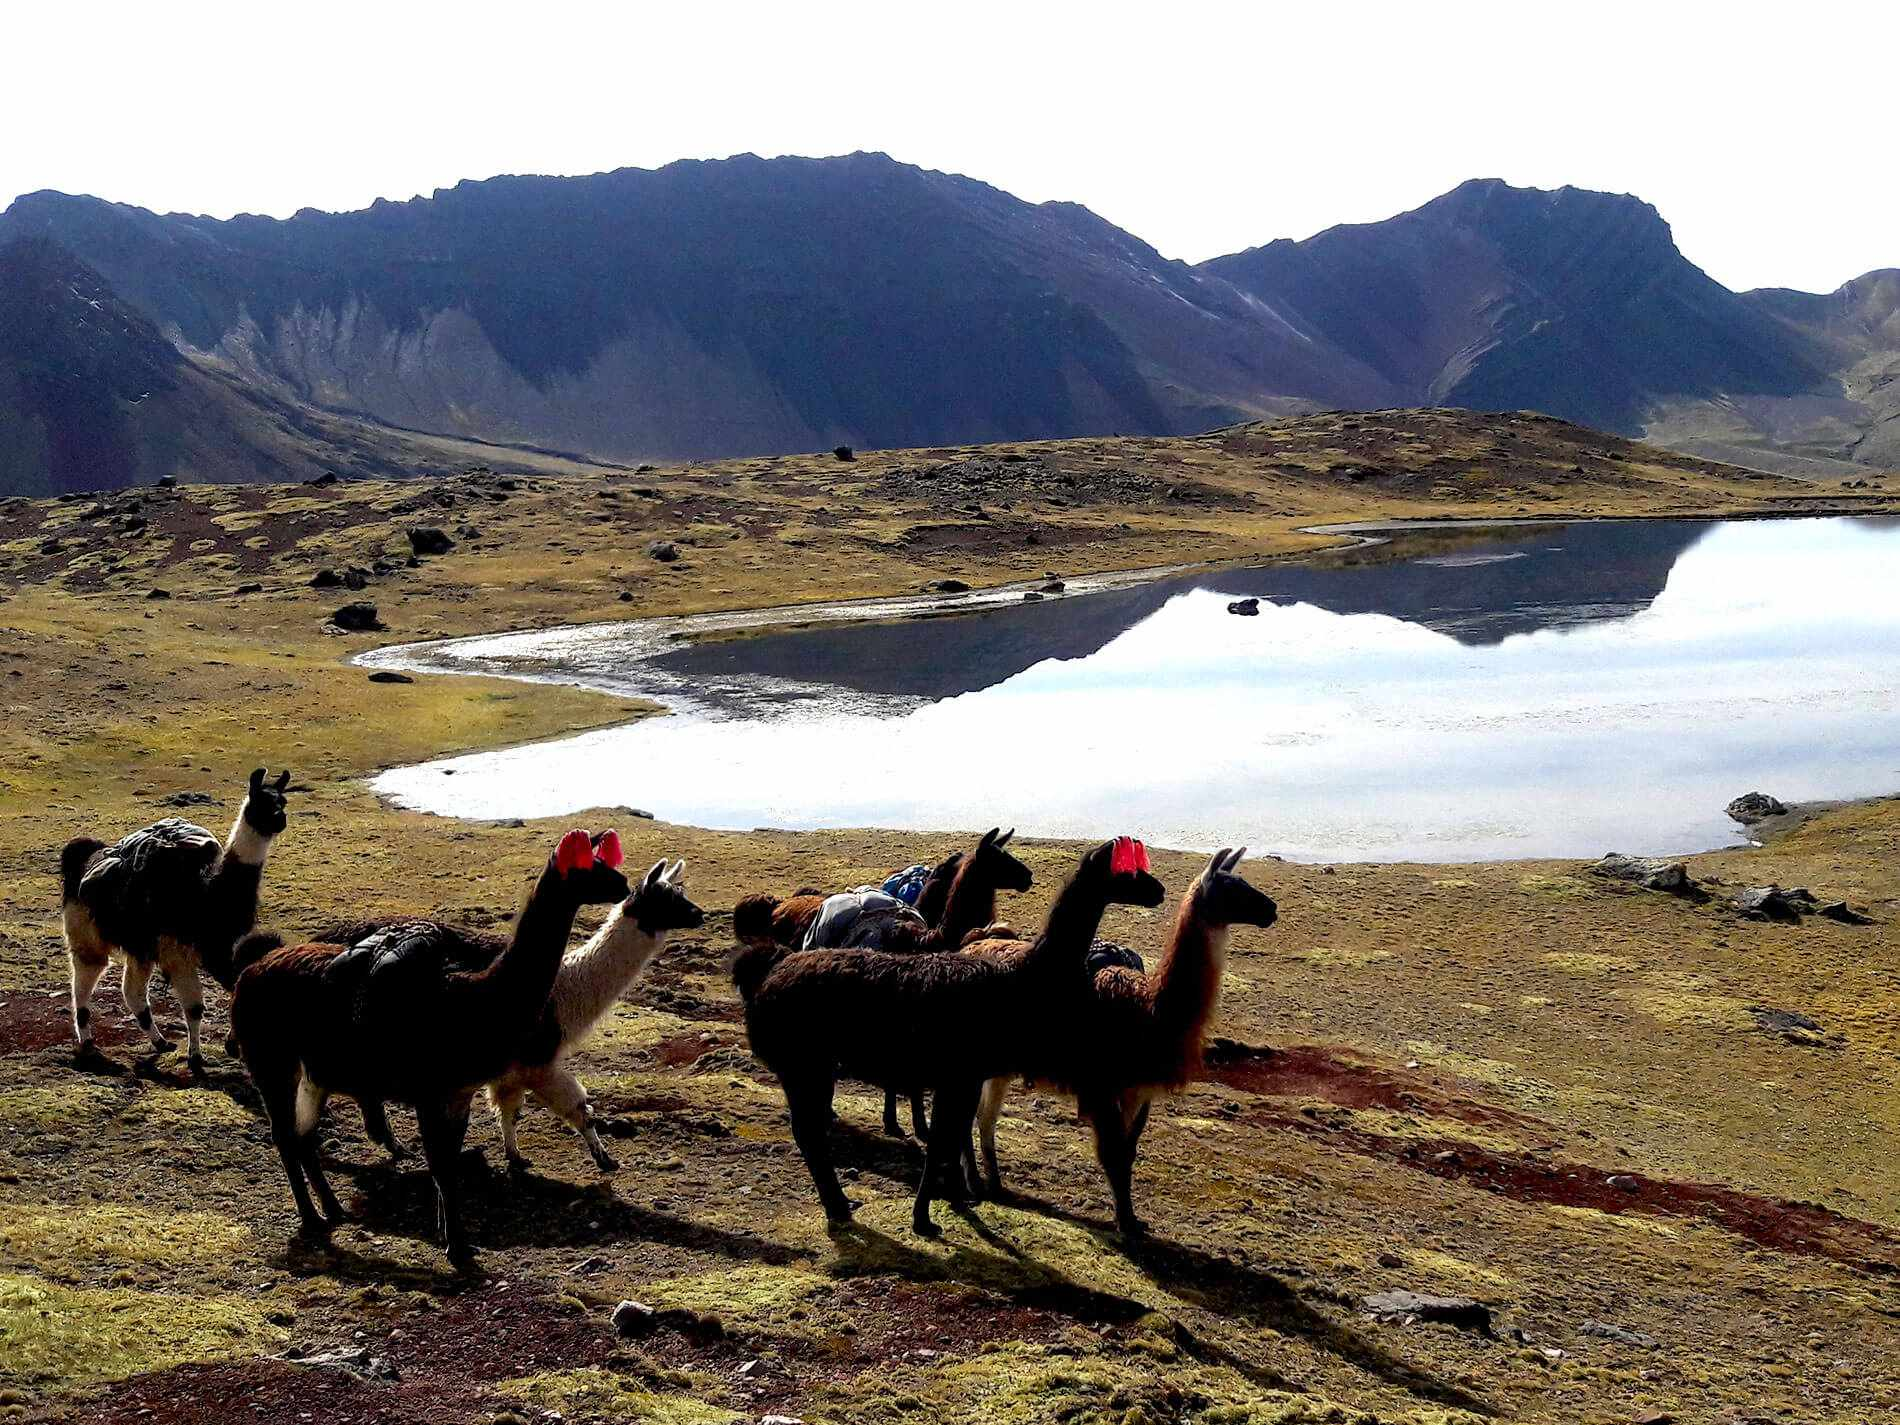 Ausangate trail to Rainbow Mountain Peru Vinicunca